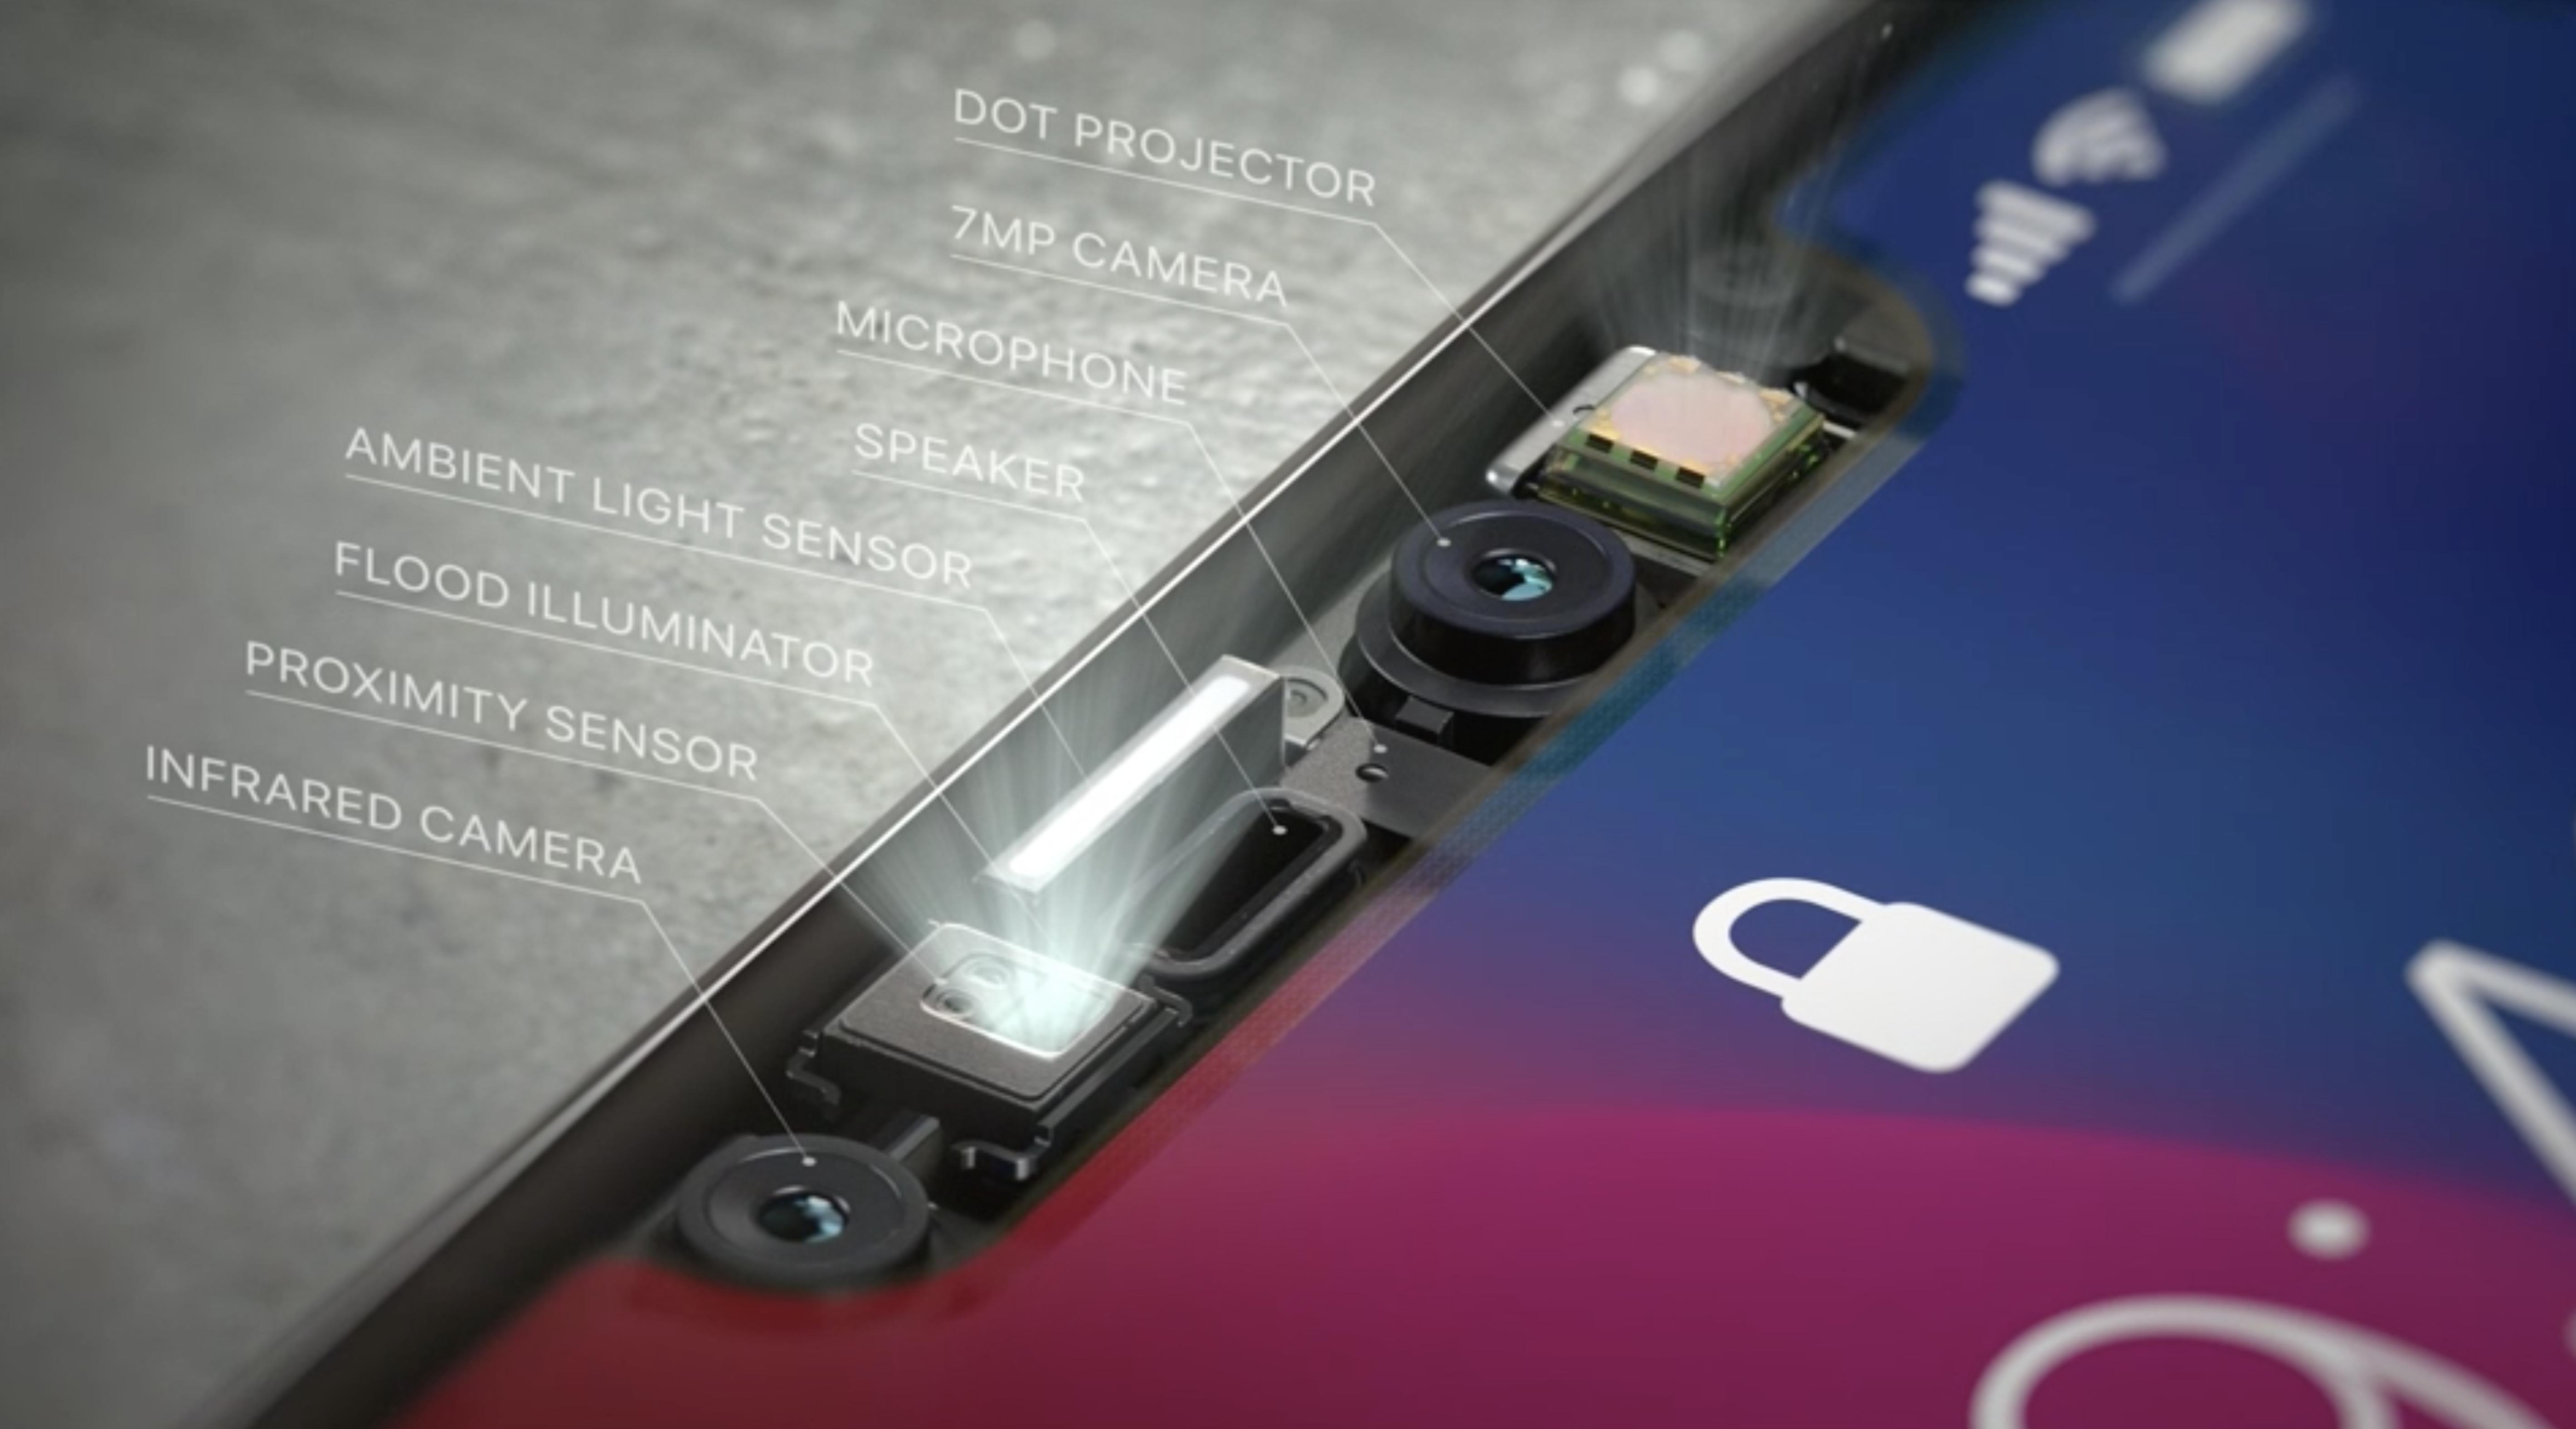 Description of different parts of TrueDepth camera